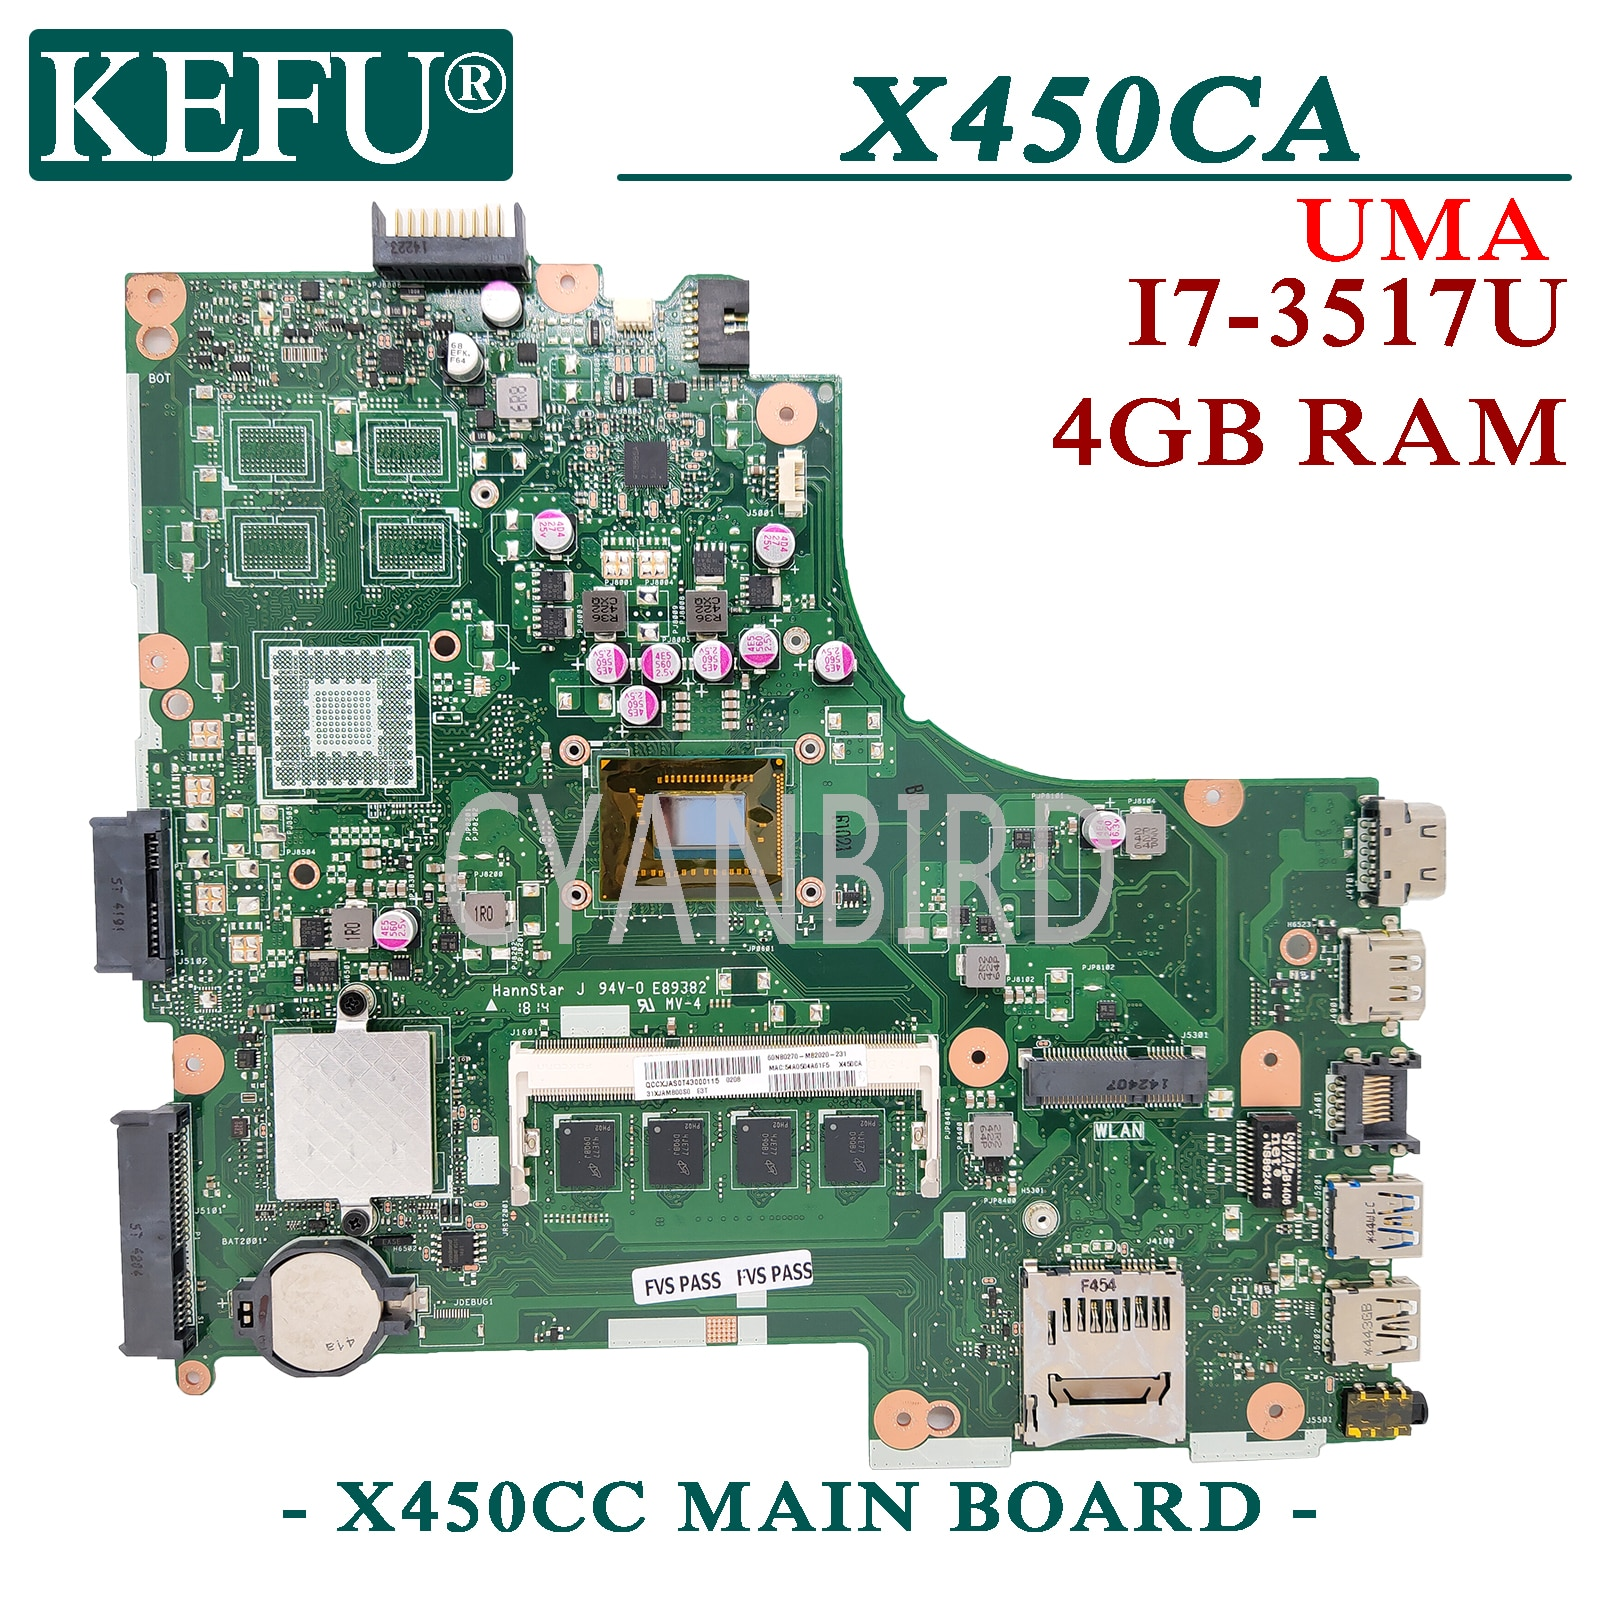 KEFU X450CC الأصلي اللوحة الرئيسية لشركة آسوس X450CA X450C مع 4GB-RAM I7-3517U اللوحة الأم للكمبيوتر المحمول